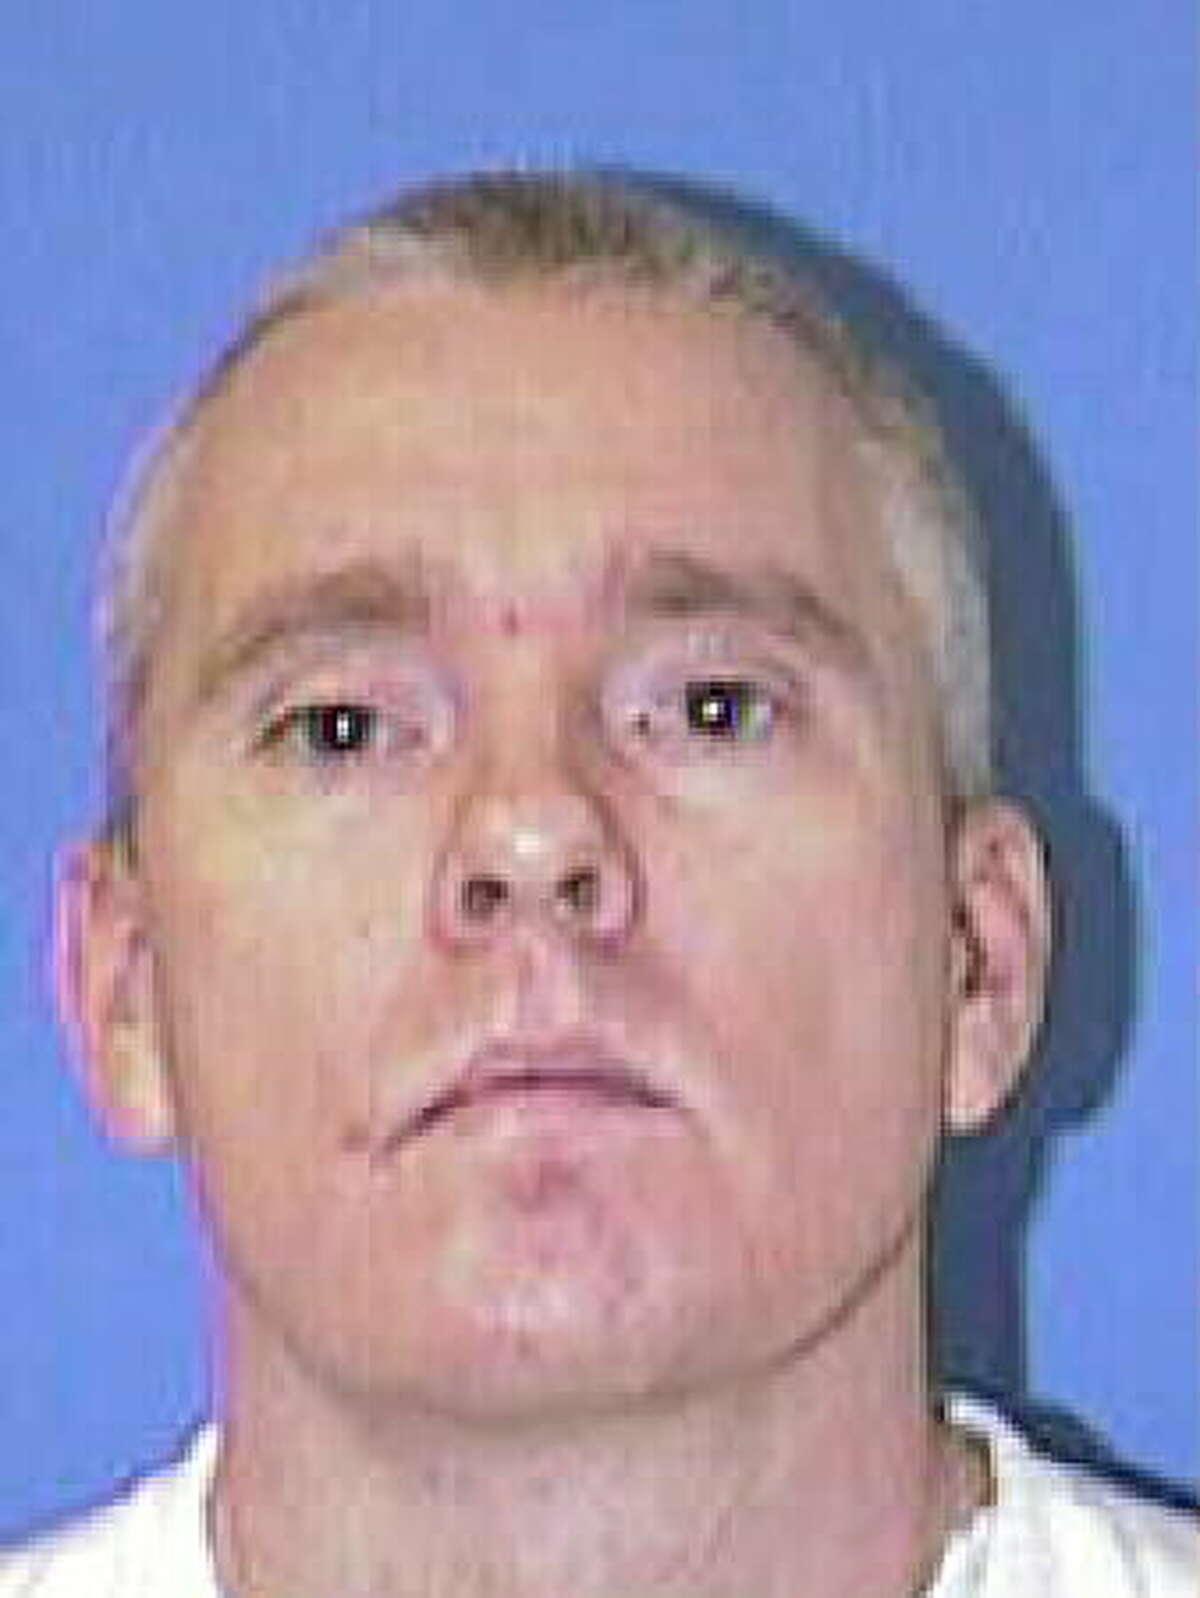 Carl Carver has been Aryan Brotherhood of Texas general. He is now in prison.